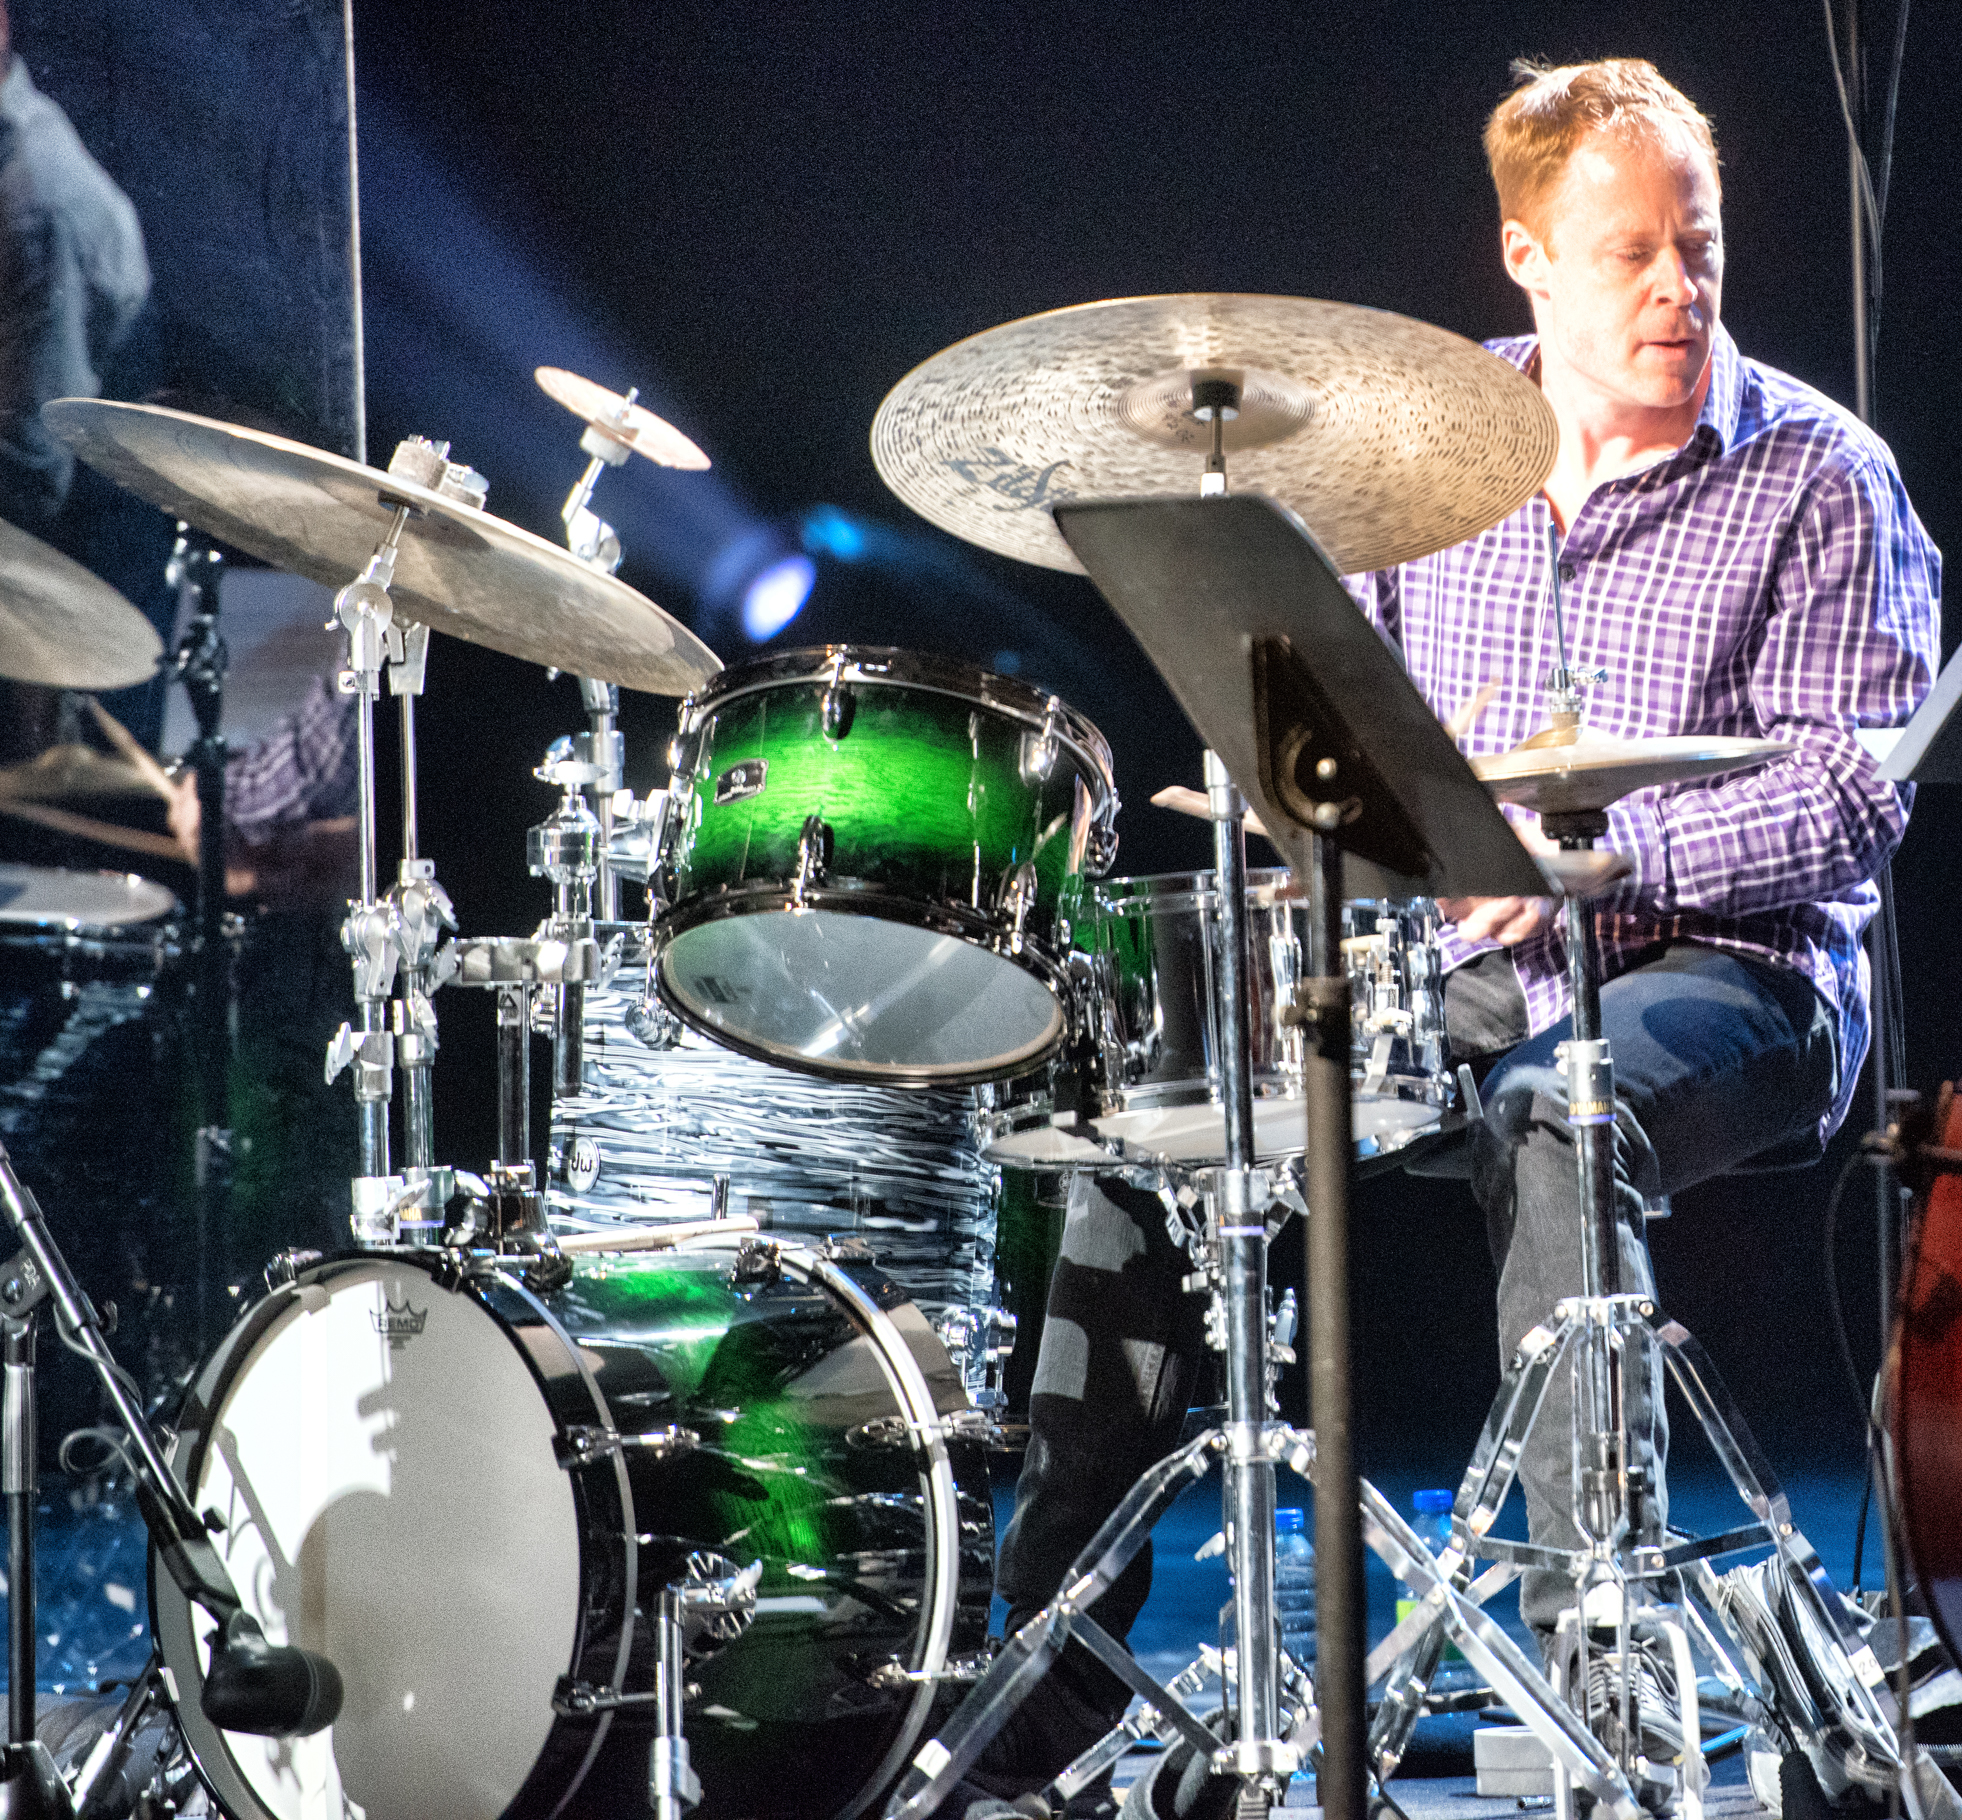 Bill Stewart with the John Scofield - Joe Lovano Quartet at the Montreal International Jazz Festival 2015